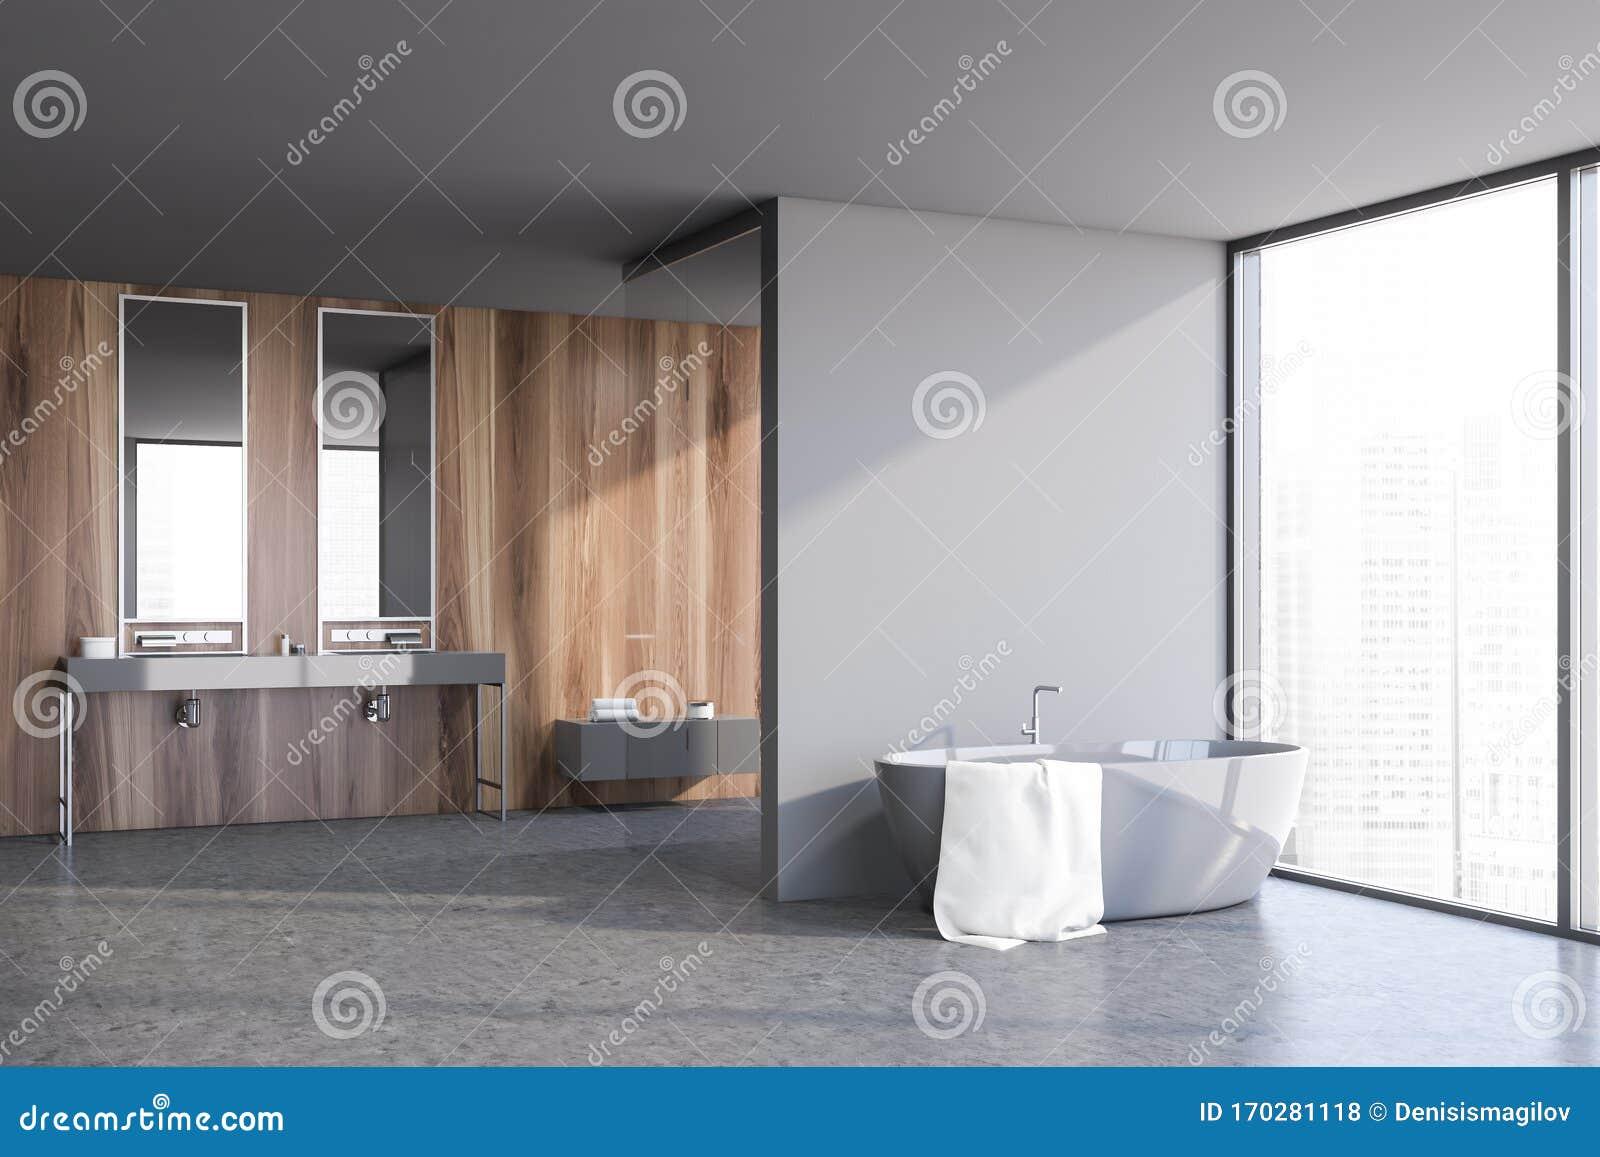 Wooden And Light Gray Bathroom Corner Stock Illustration